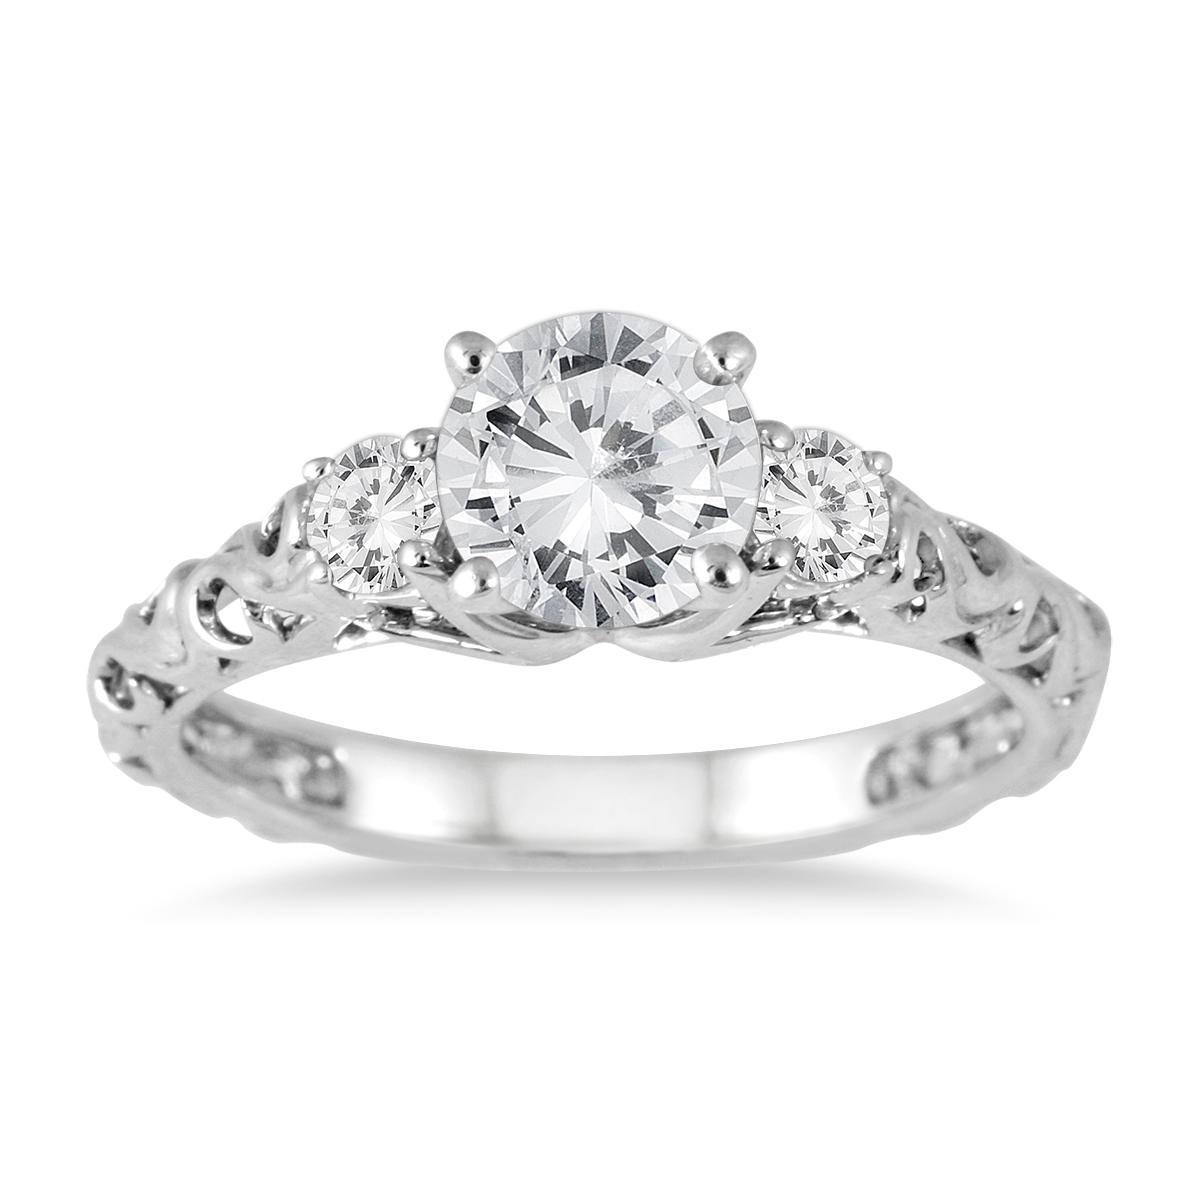 AGS Certified 1 Carat TW Diamond Three